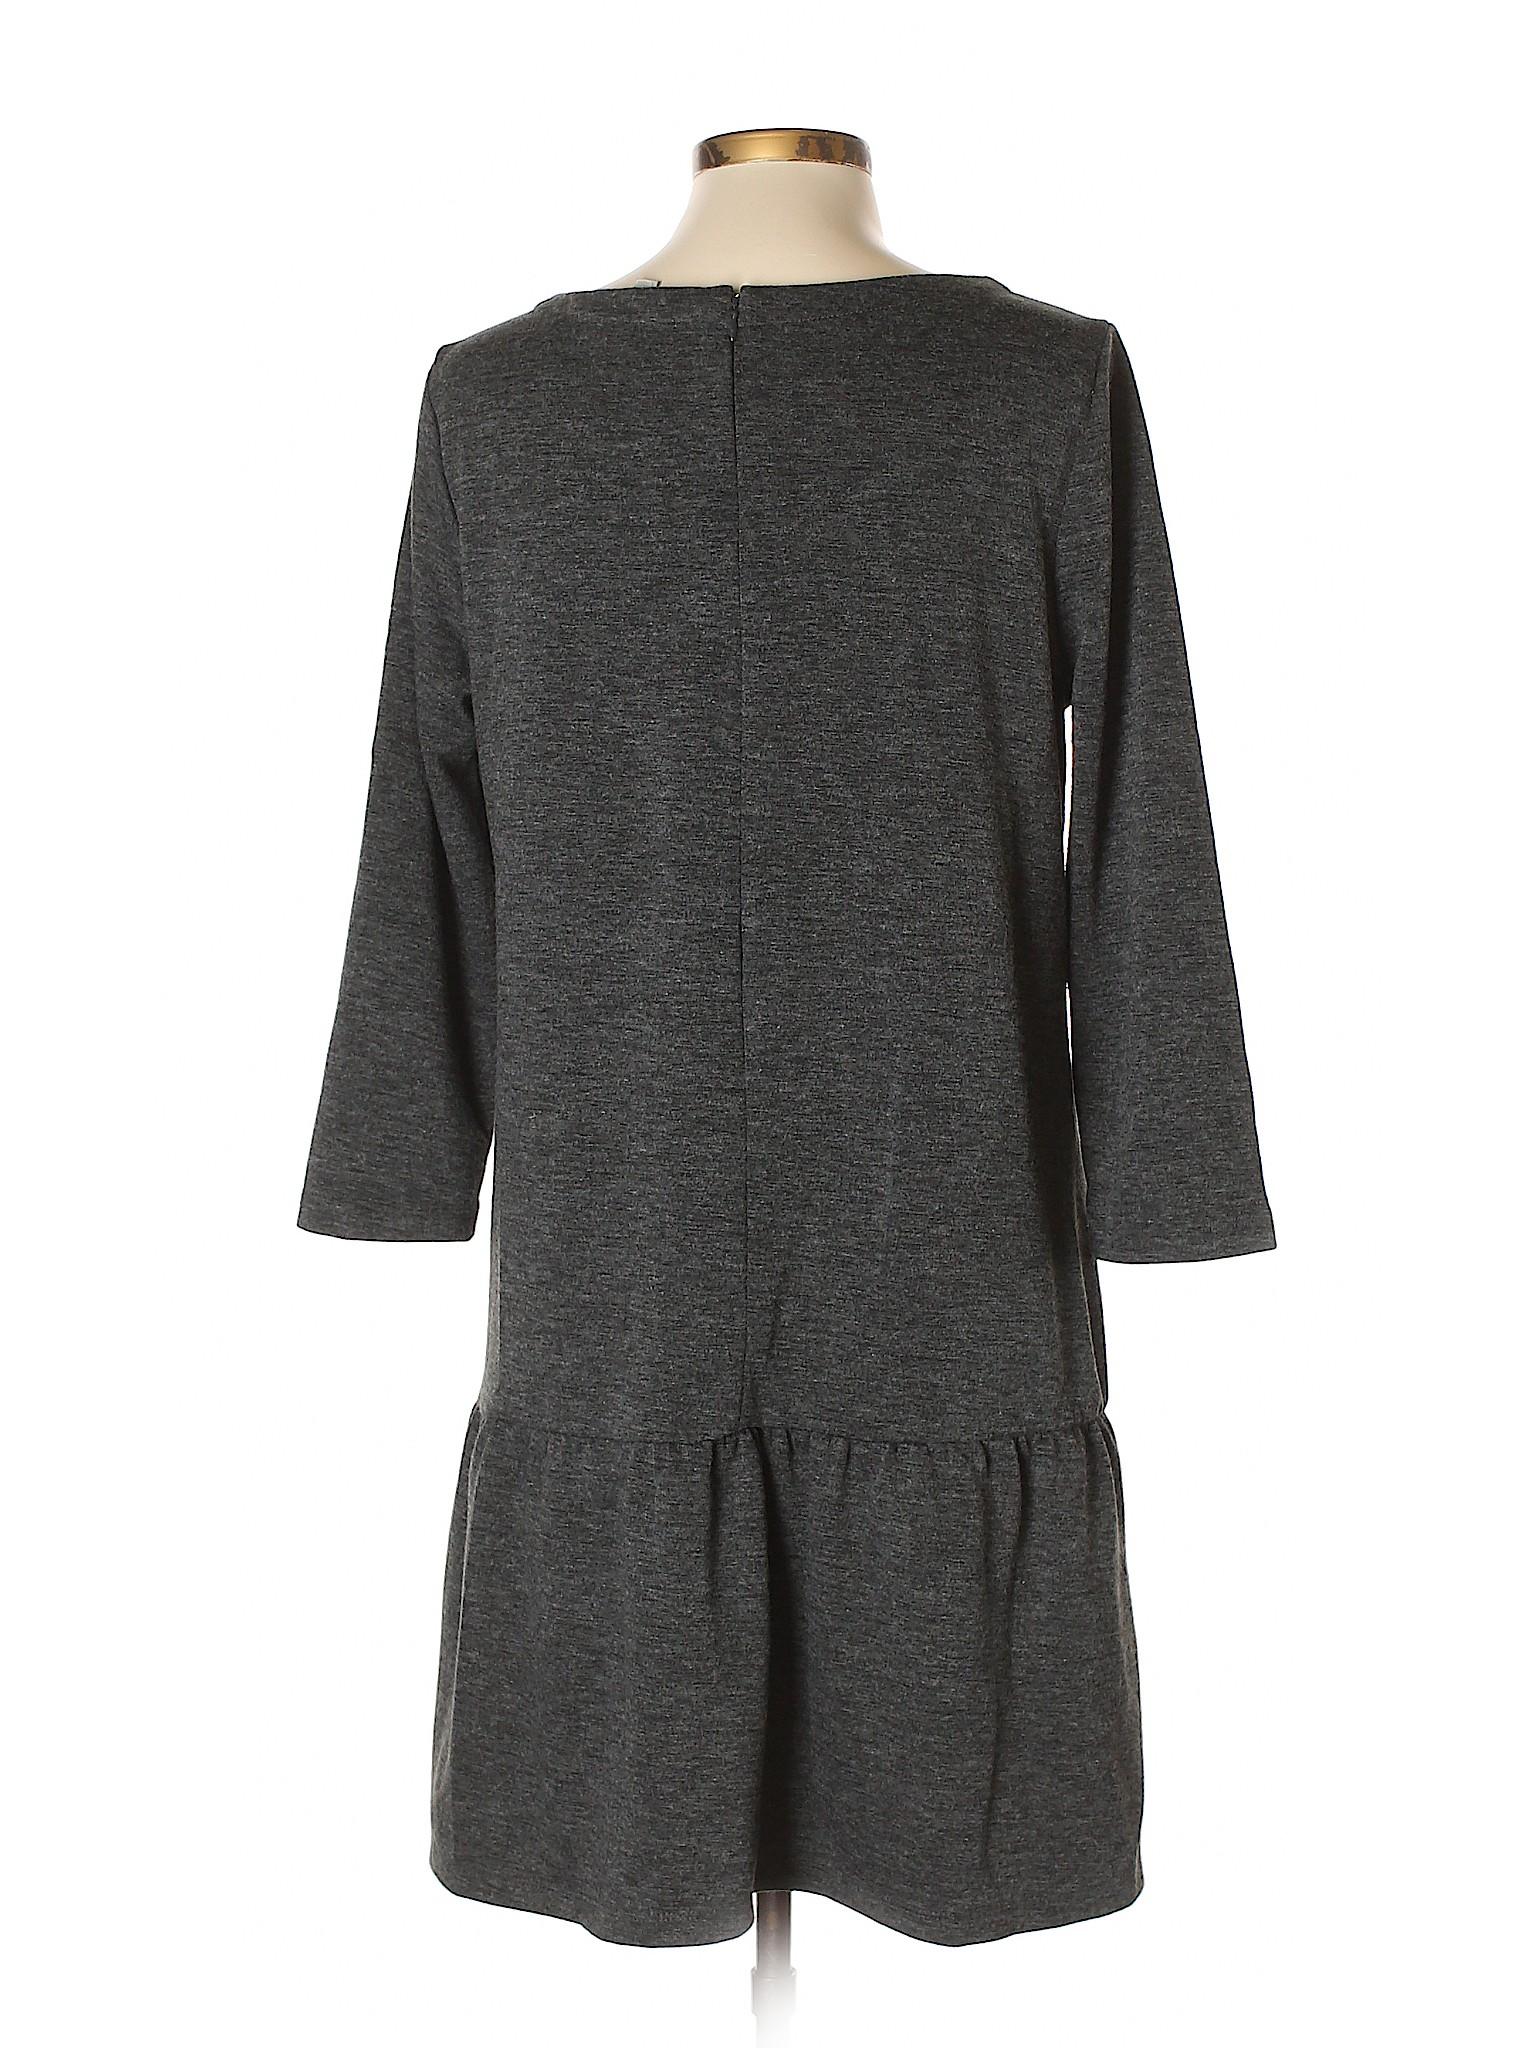 Dress Ann Casual winter LOFT Taylor Boutique x5w8Xpqx